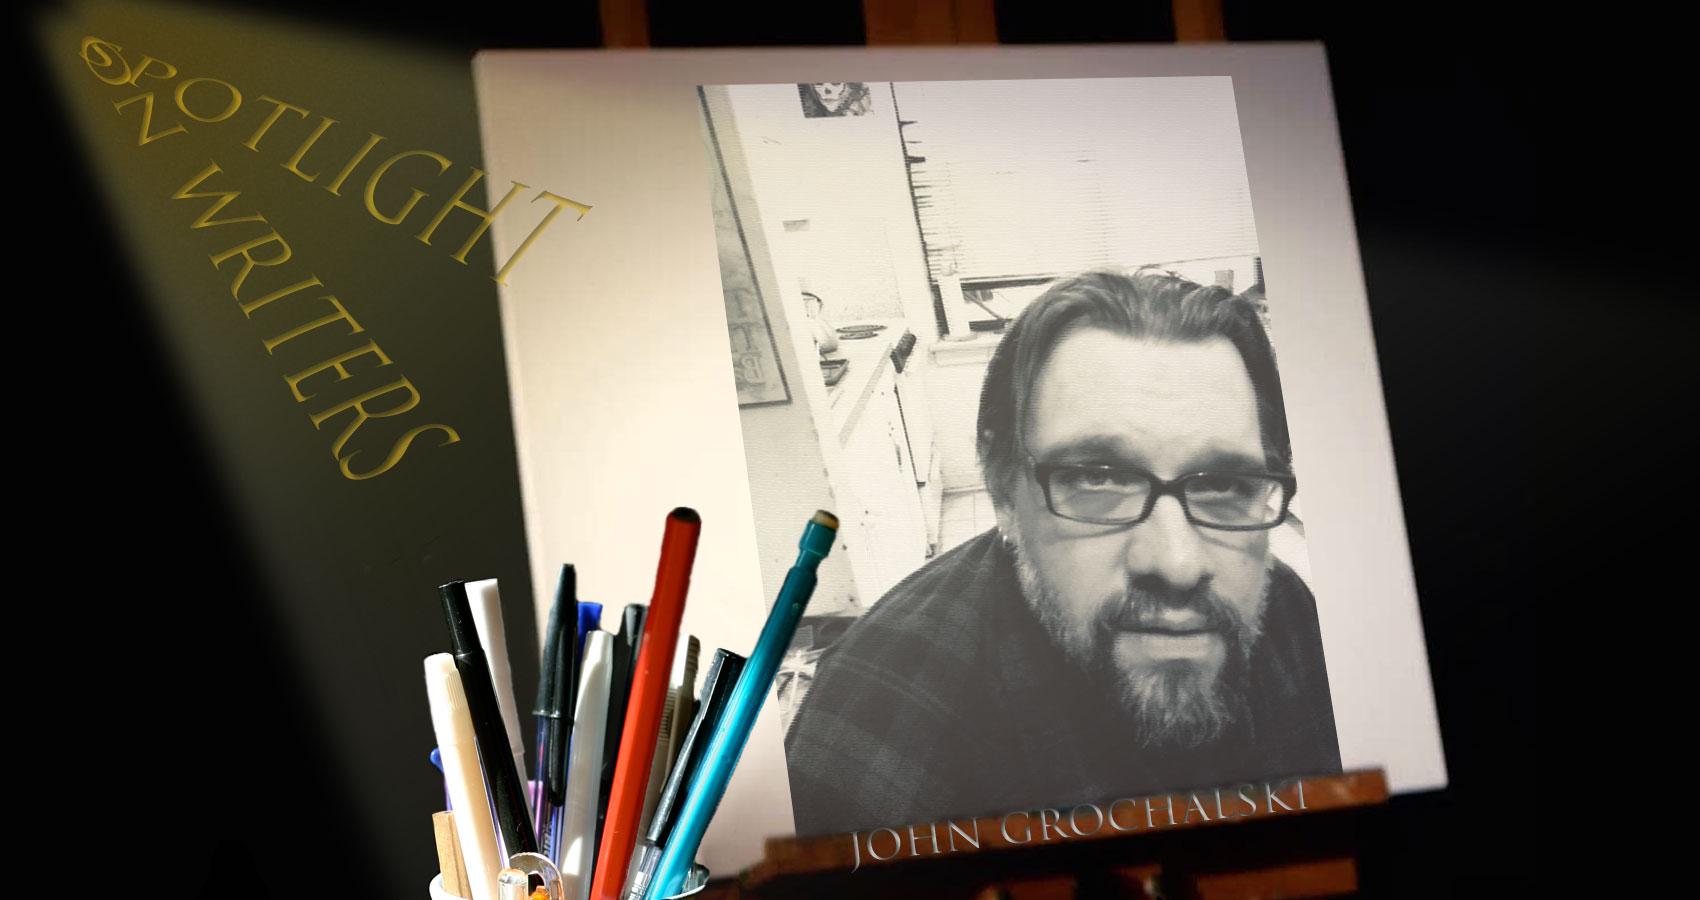 Spotlight On Writers - John Grochalski, interview at Spillwords.com